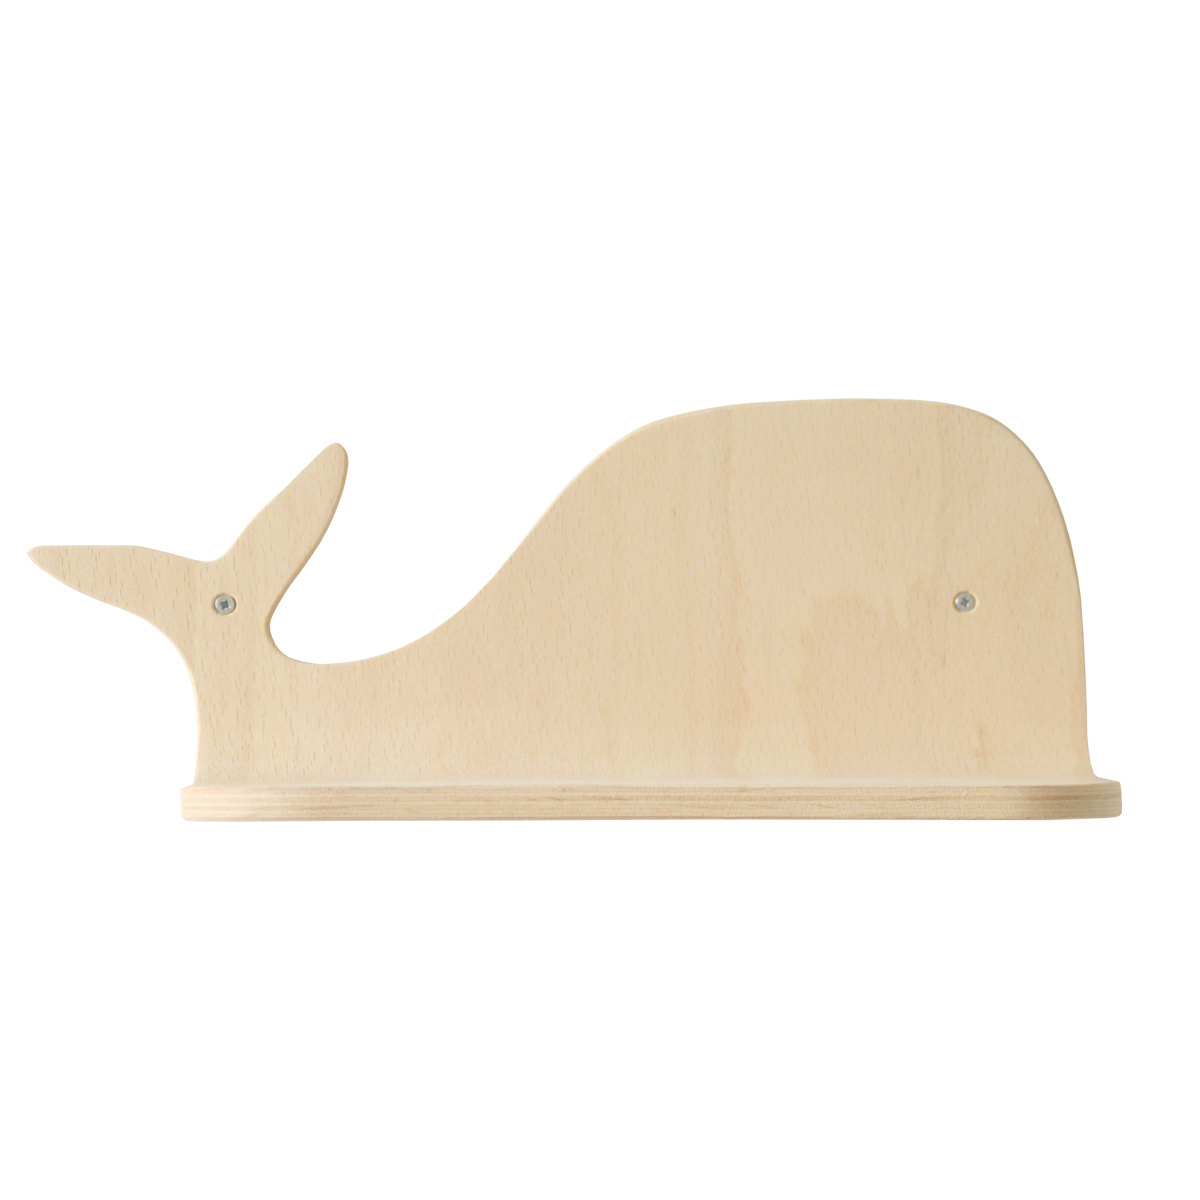 Étagère Étagère Baleine Étagère Baleine